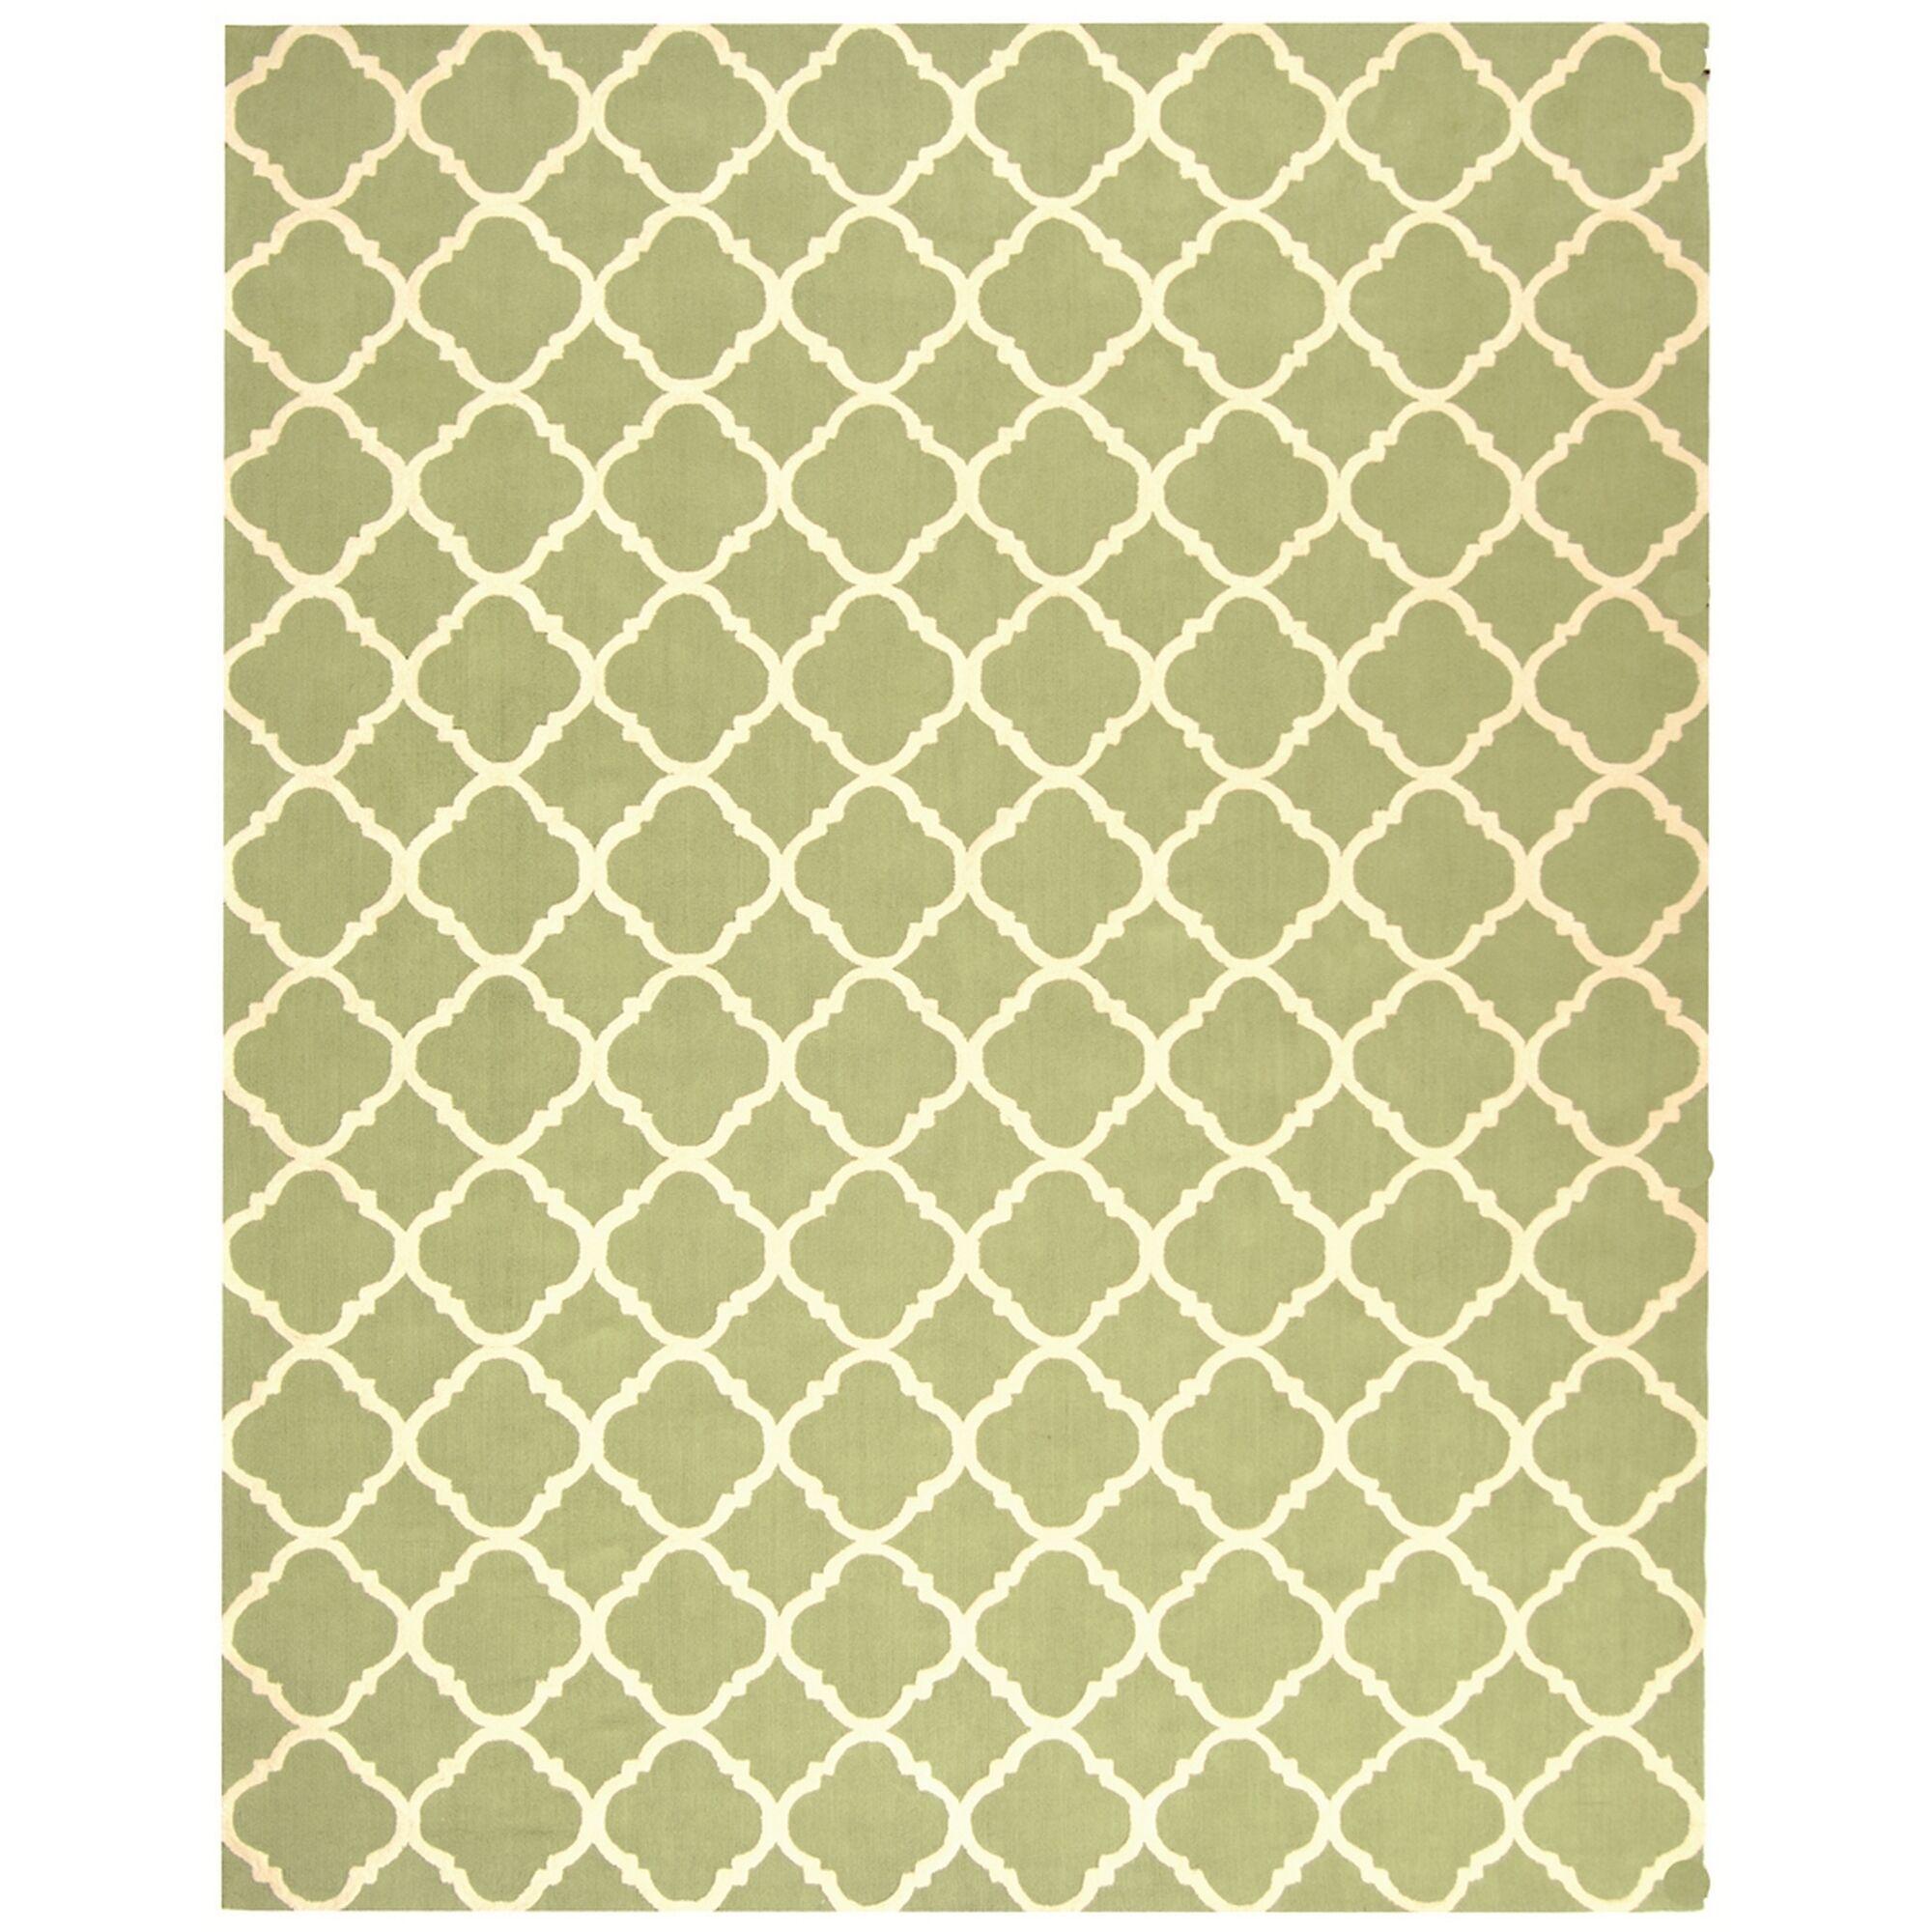 Fullerton Green/Ivory Geometric Area Rug Rug Size: Rectangle 7'9